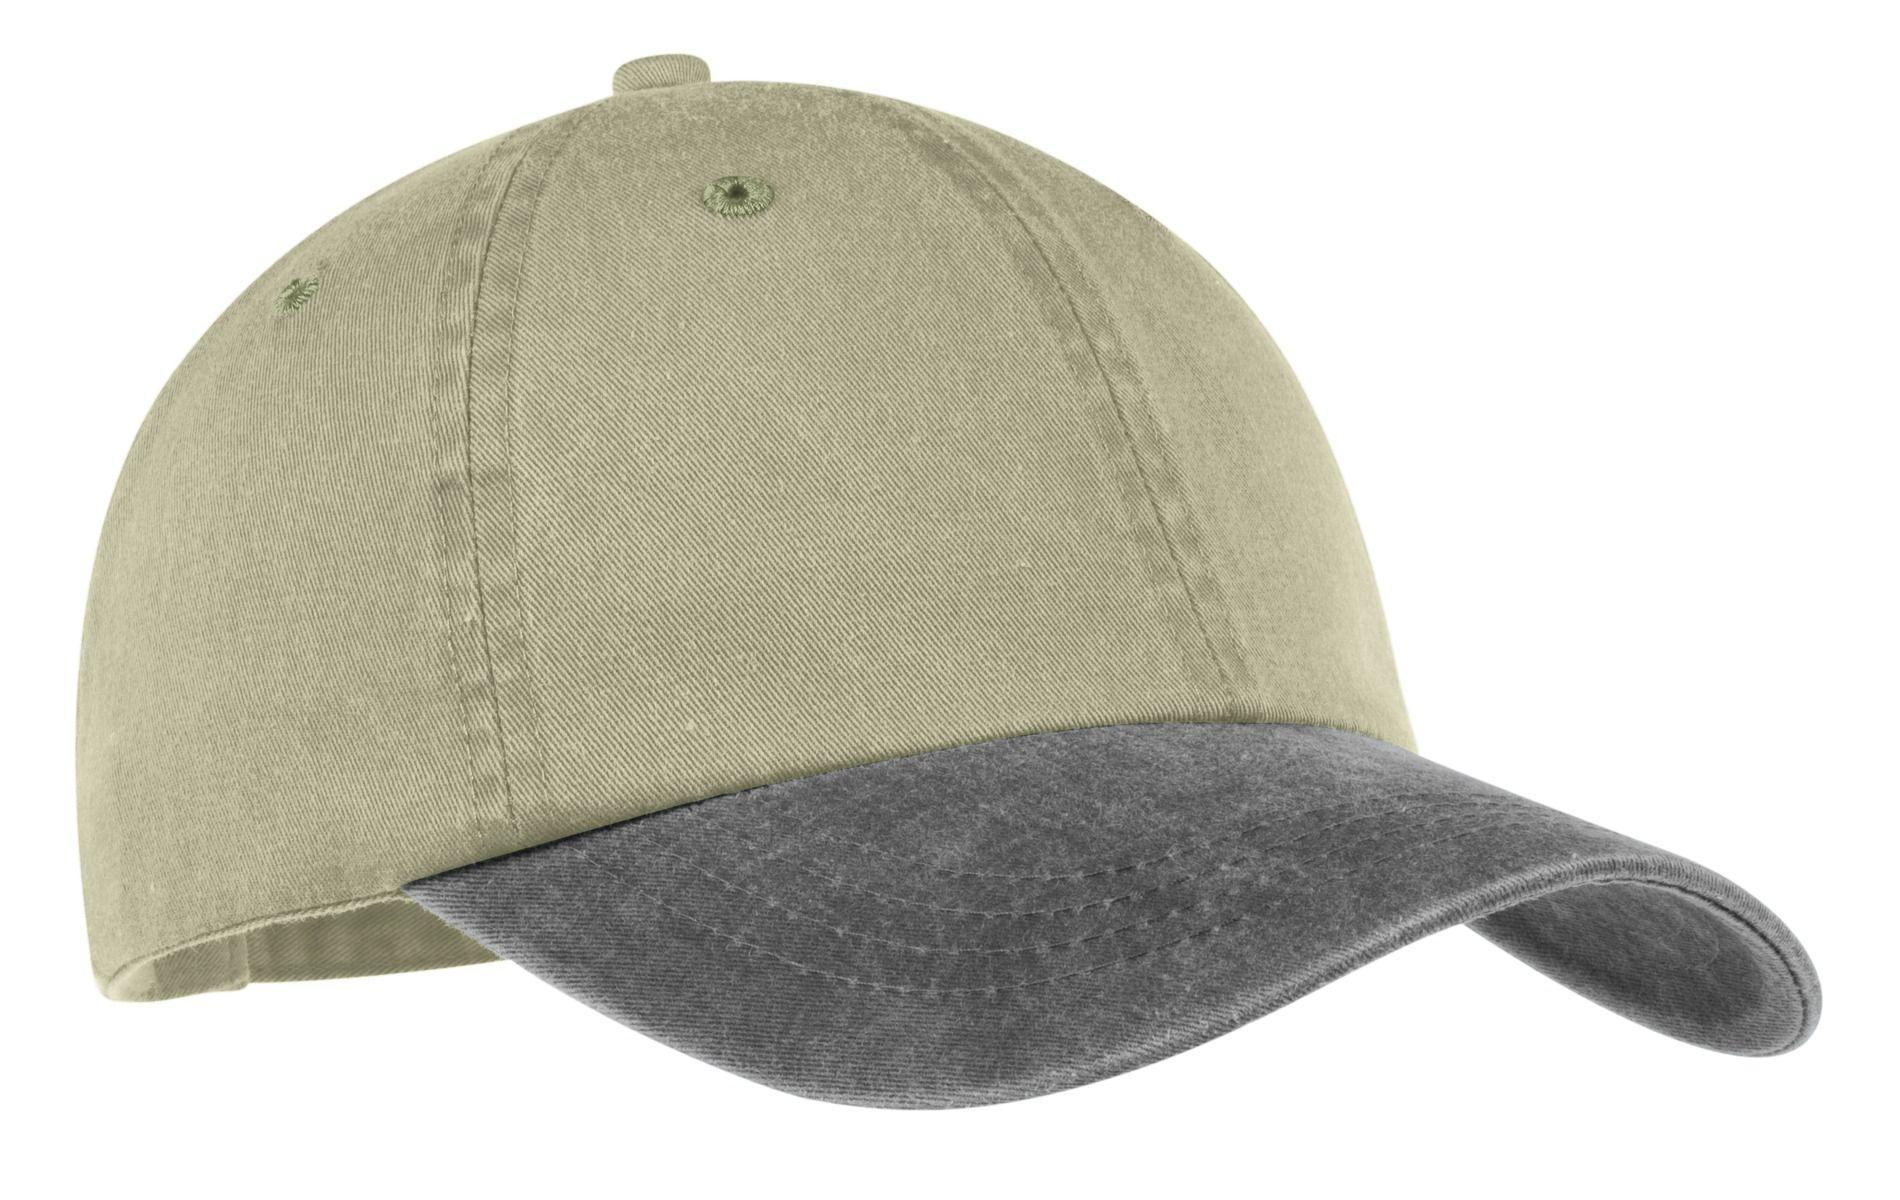 d333fb5107fd9 ... Port & Company CP83 Pigment-Dyed Dad Hat Khaki/Charcoal ...